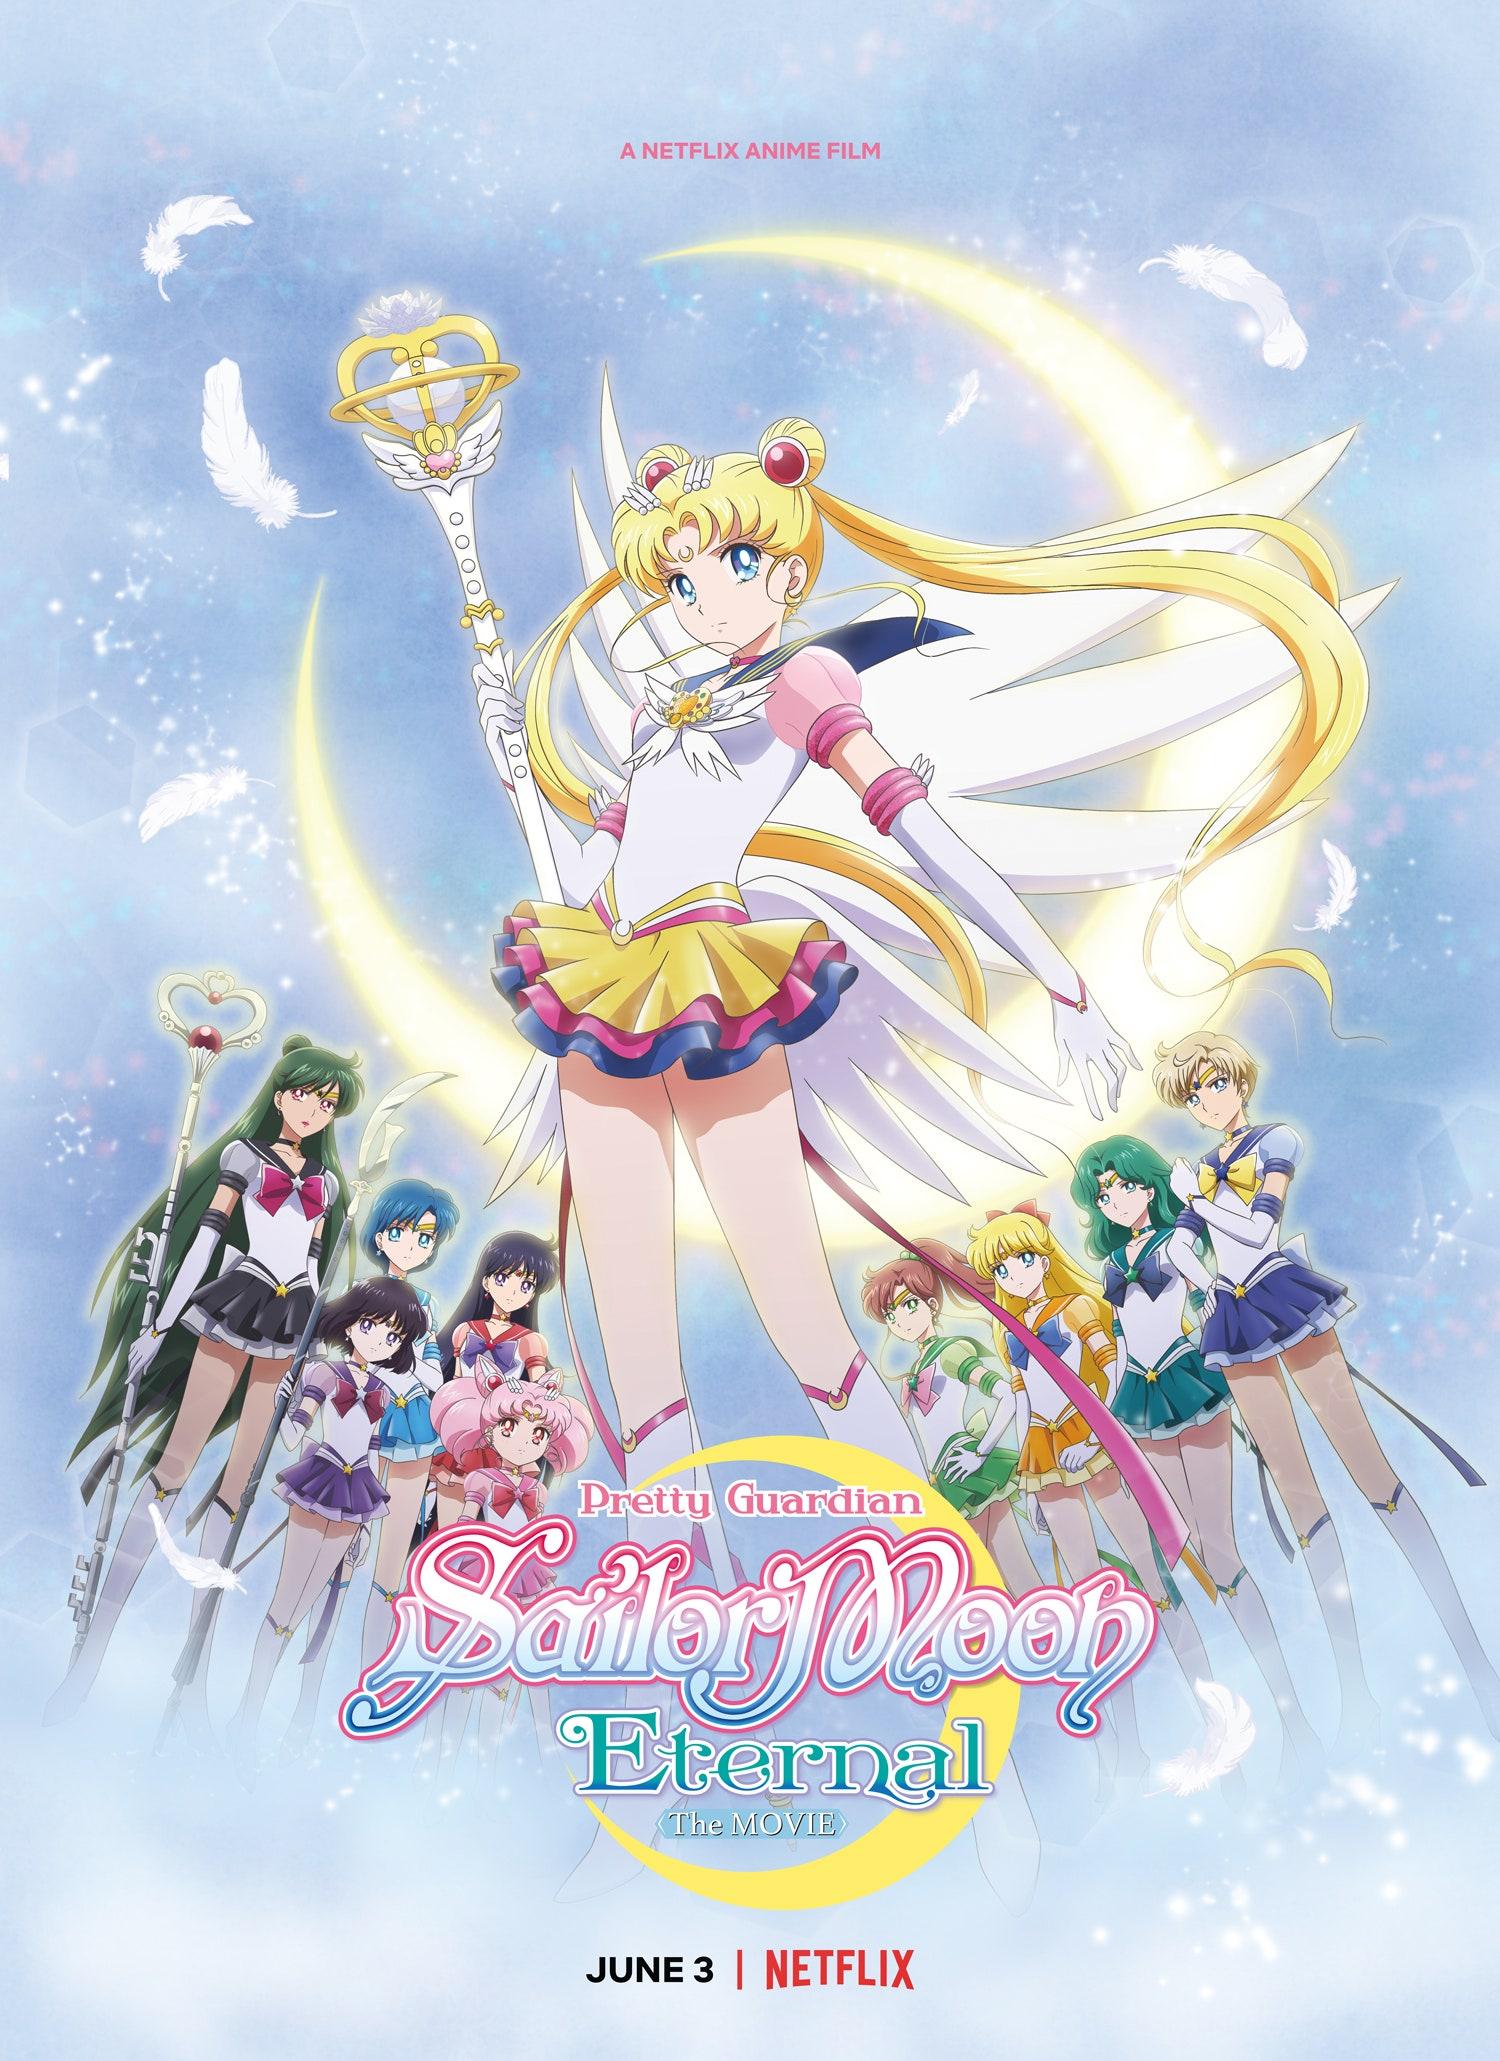 SailorMoonEternalTheMovie_Main_Part2_Ver